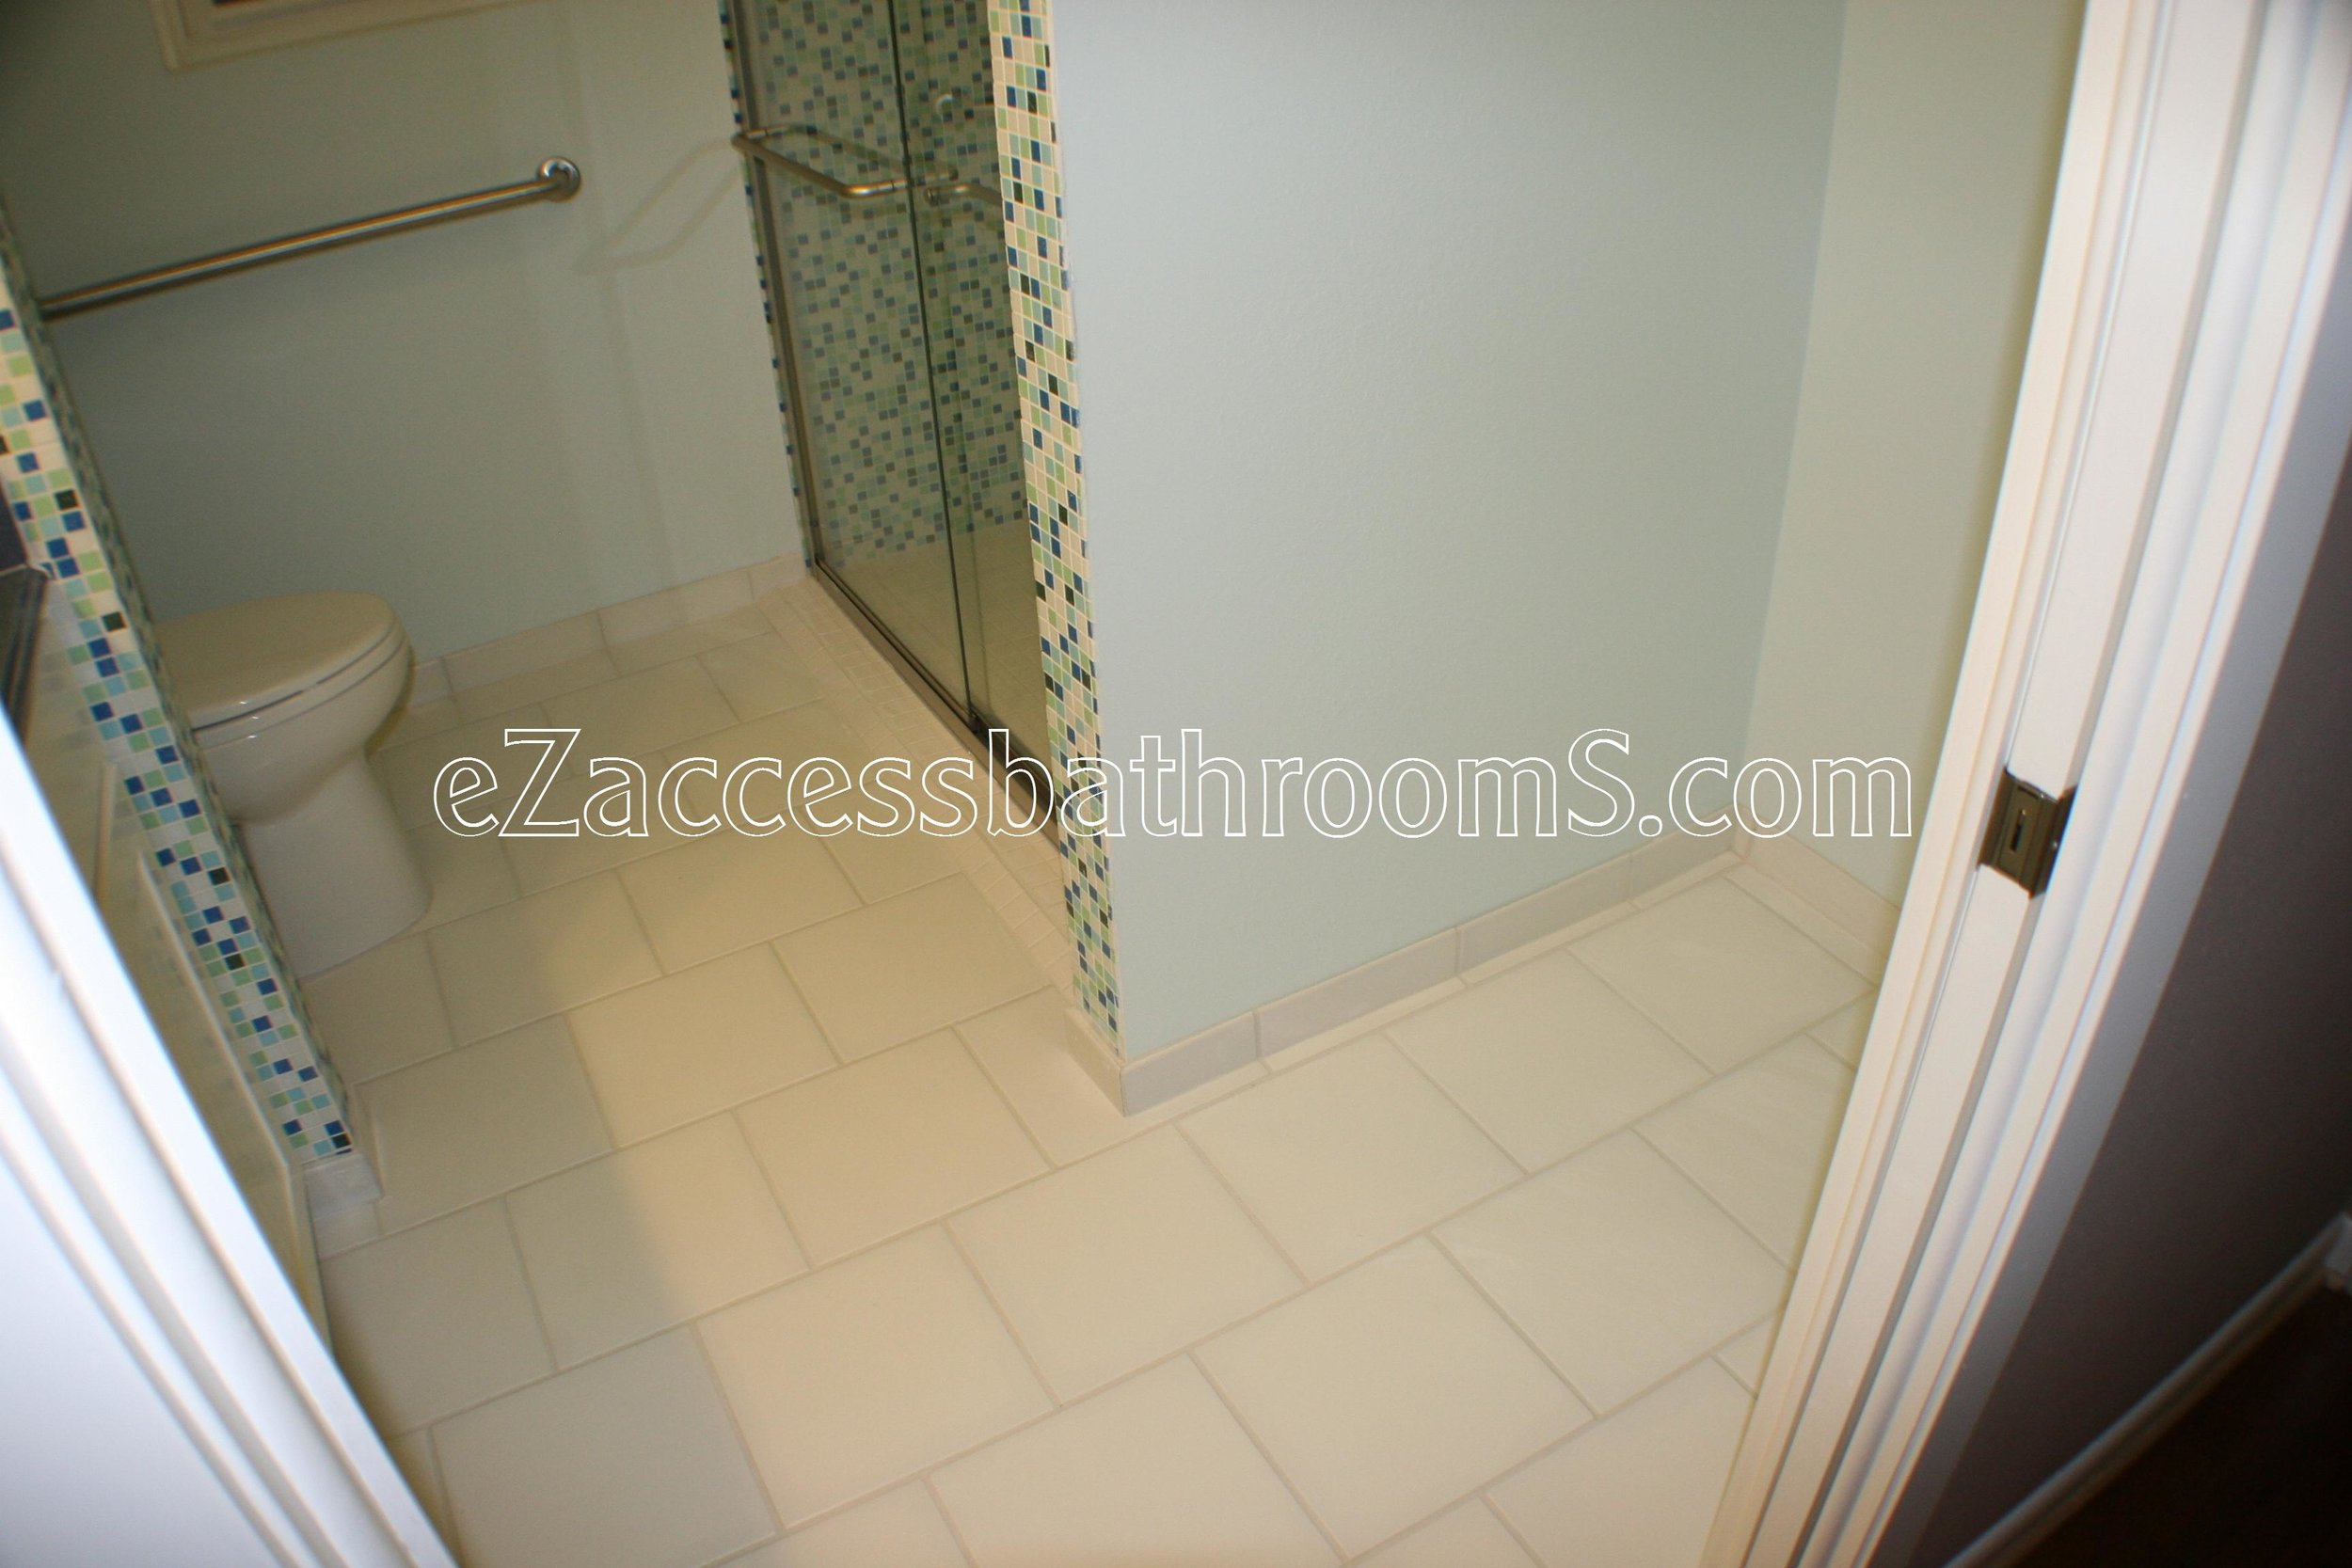 Holmes Barrier Free Shower Ezaccessbathrooms Com